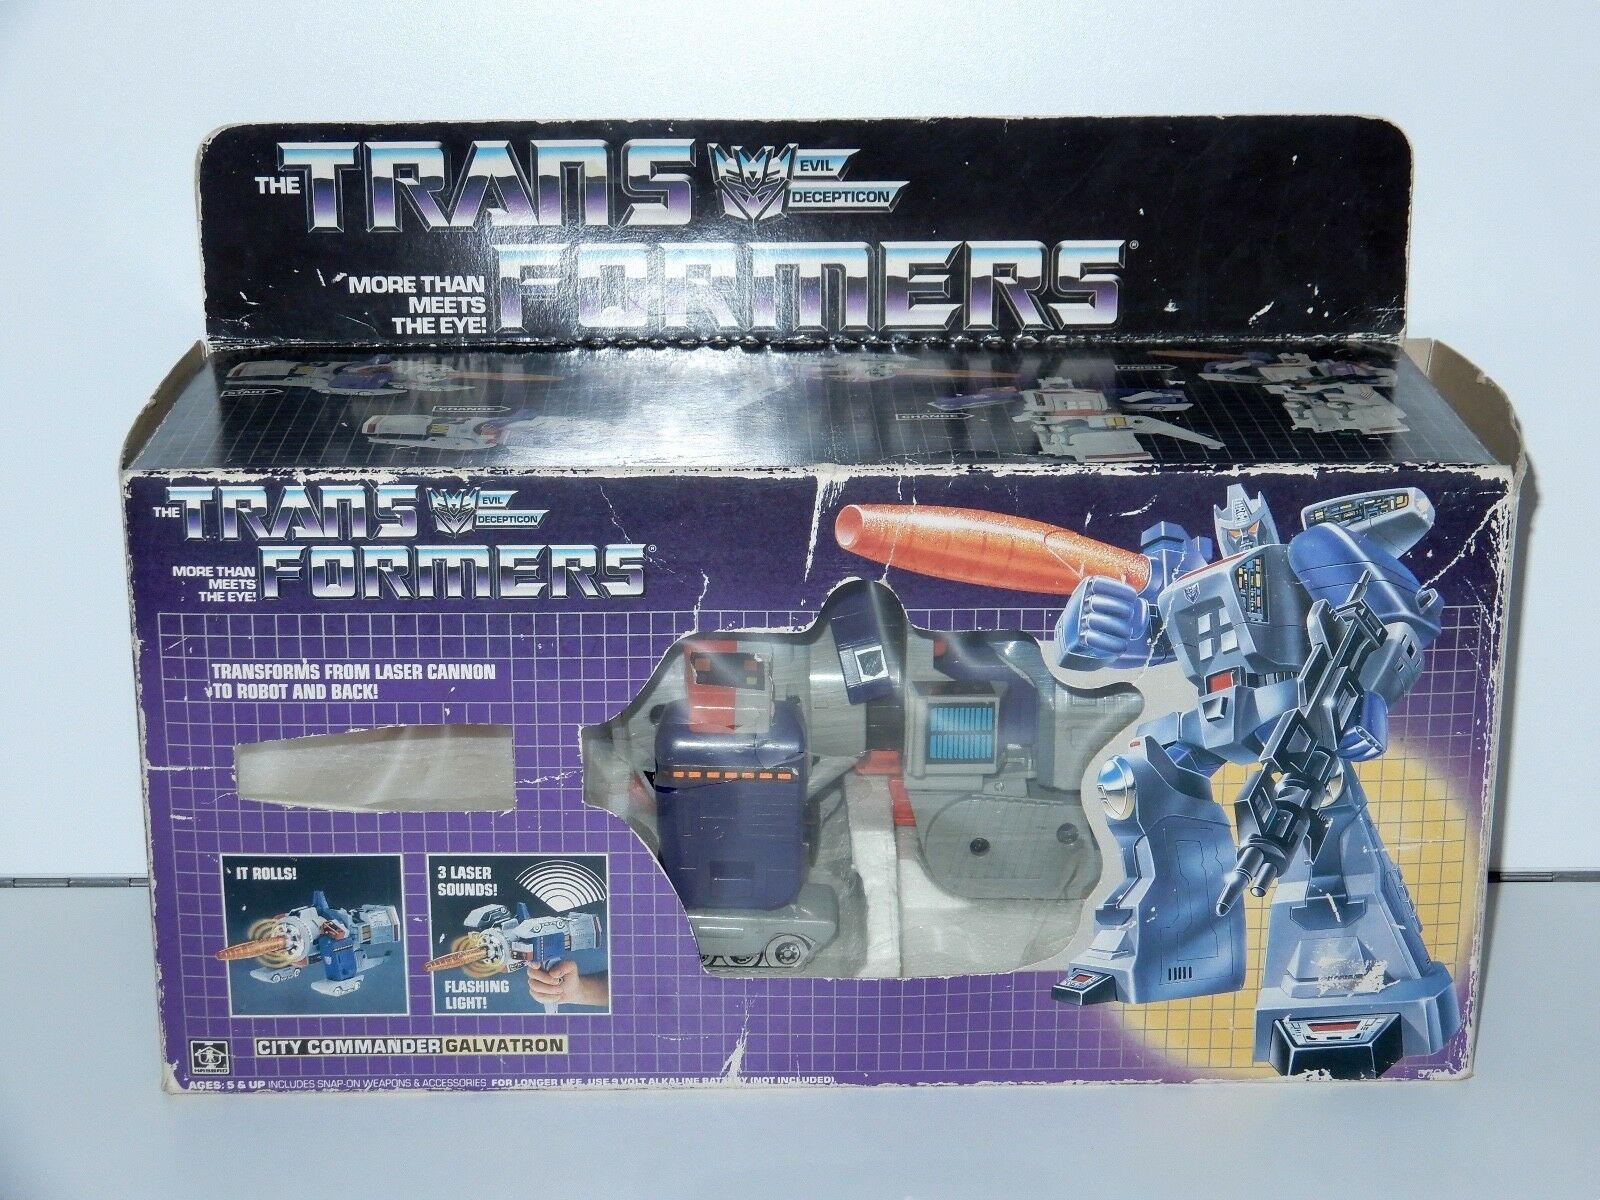 TRANSFORMERS G1 LEADERS GALVATRON 100% COMPLETE IN ORIGINAL BOX 1980s HASBRO